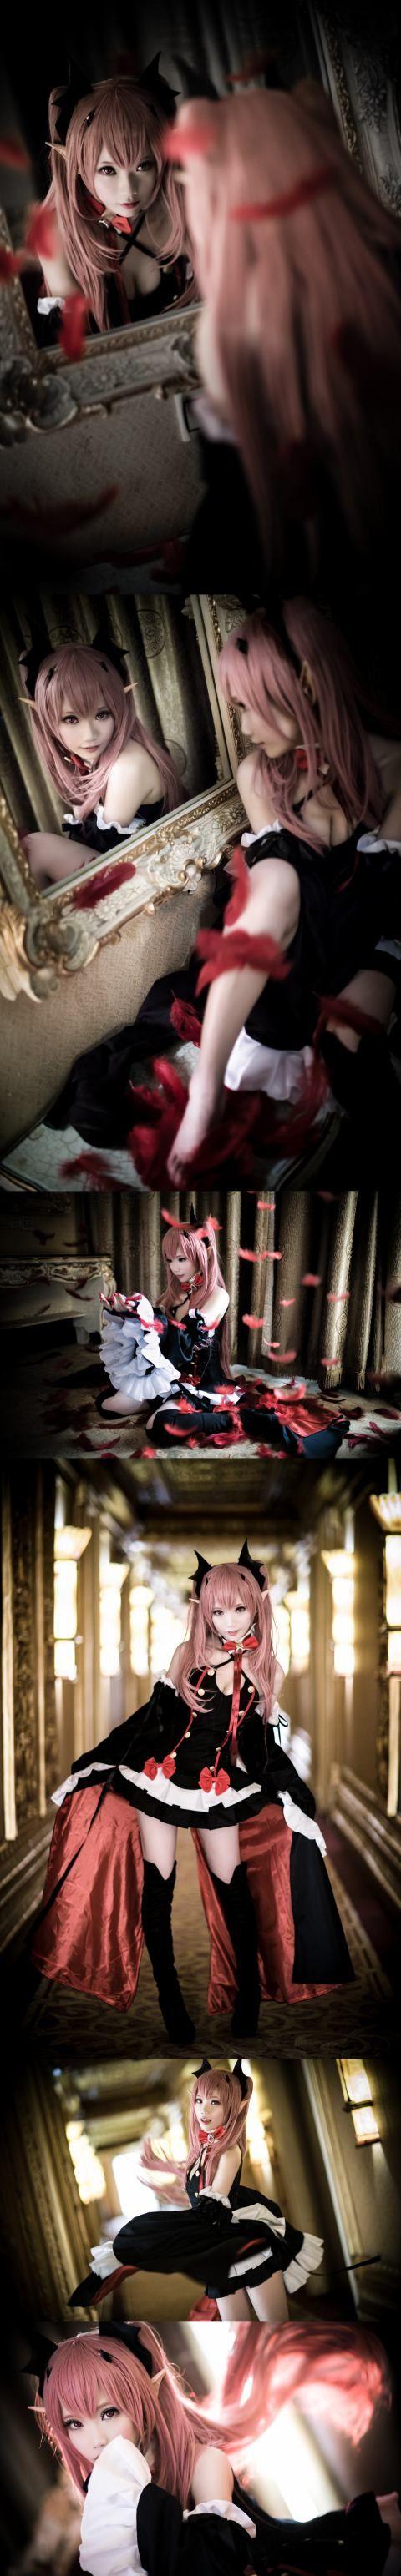 #Cosplay Owari no Seraph Hot #cosplay #sexy cosplay #erotic cosplay seen also at cosplayerotica.3dpornworld.com